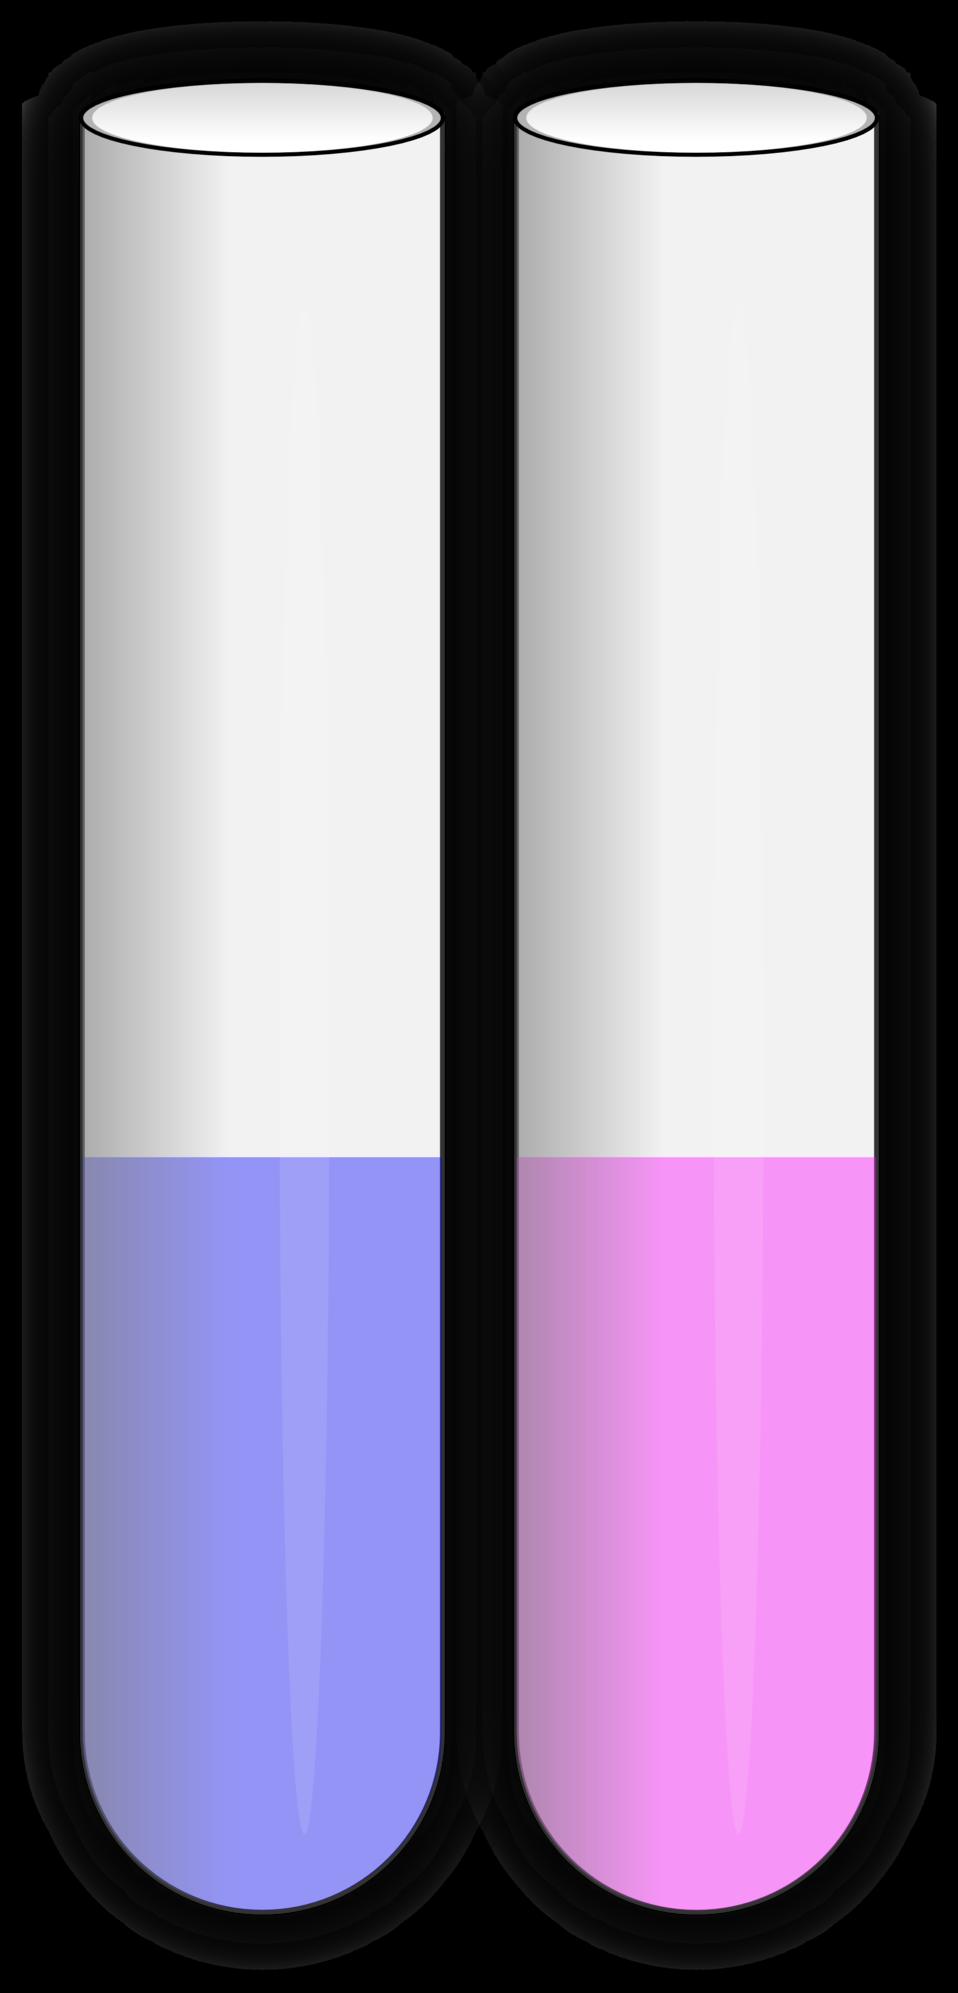 Test Tubes (Open)